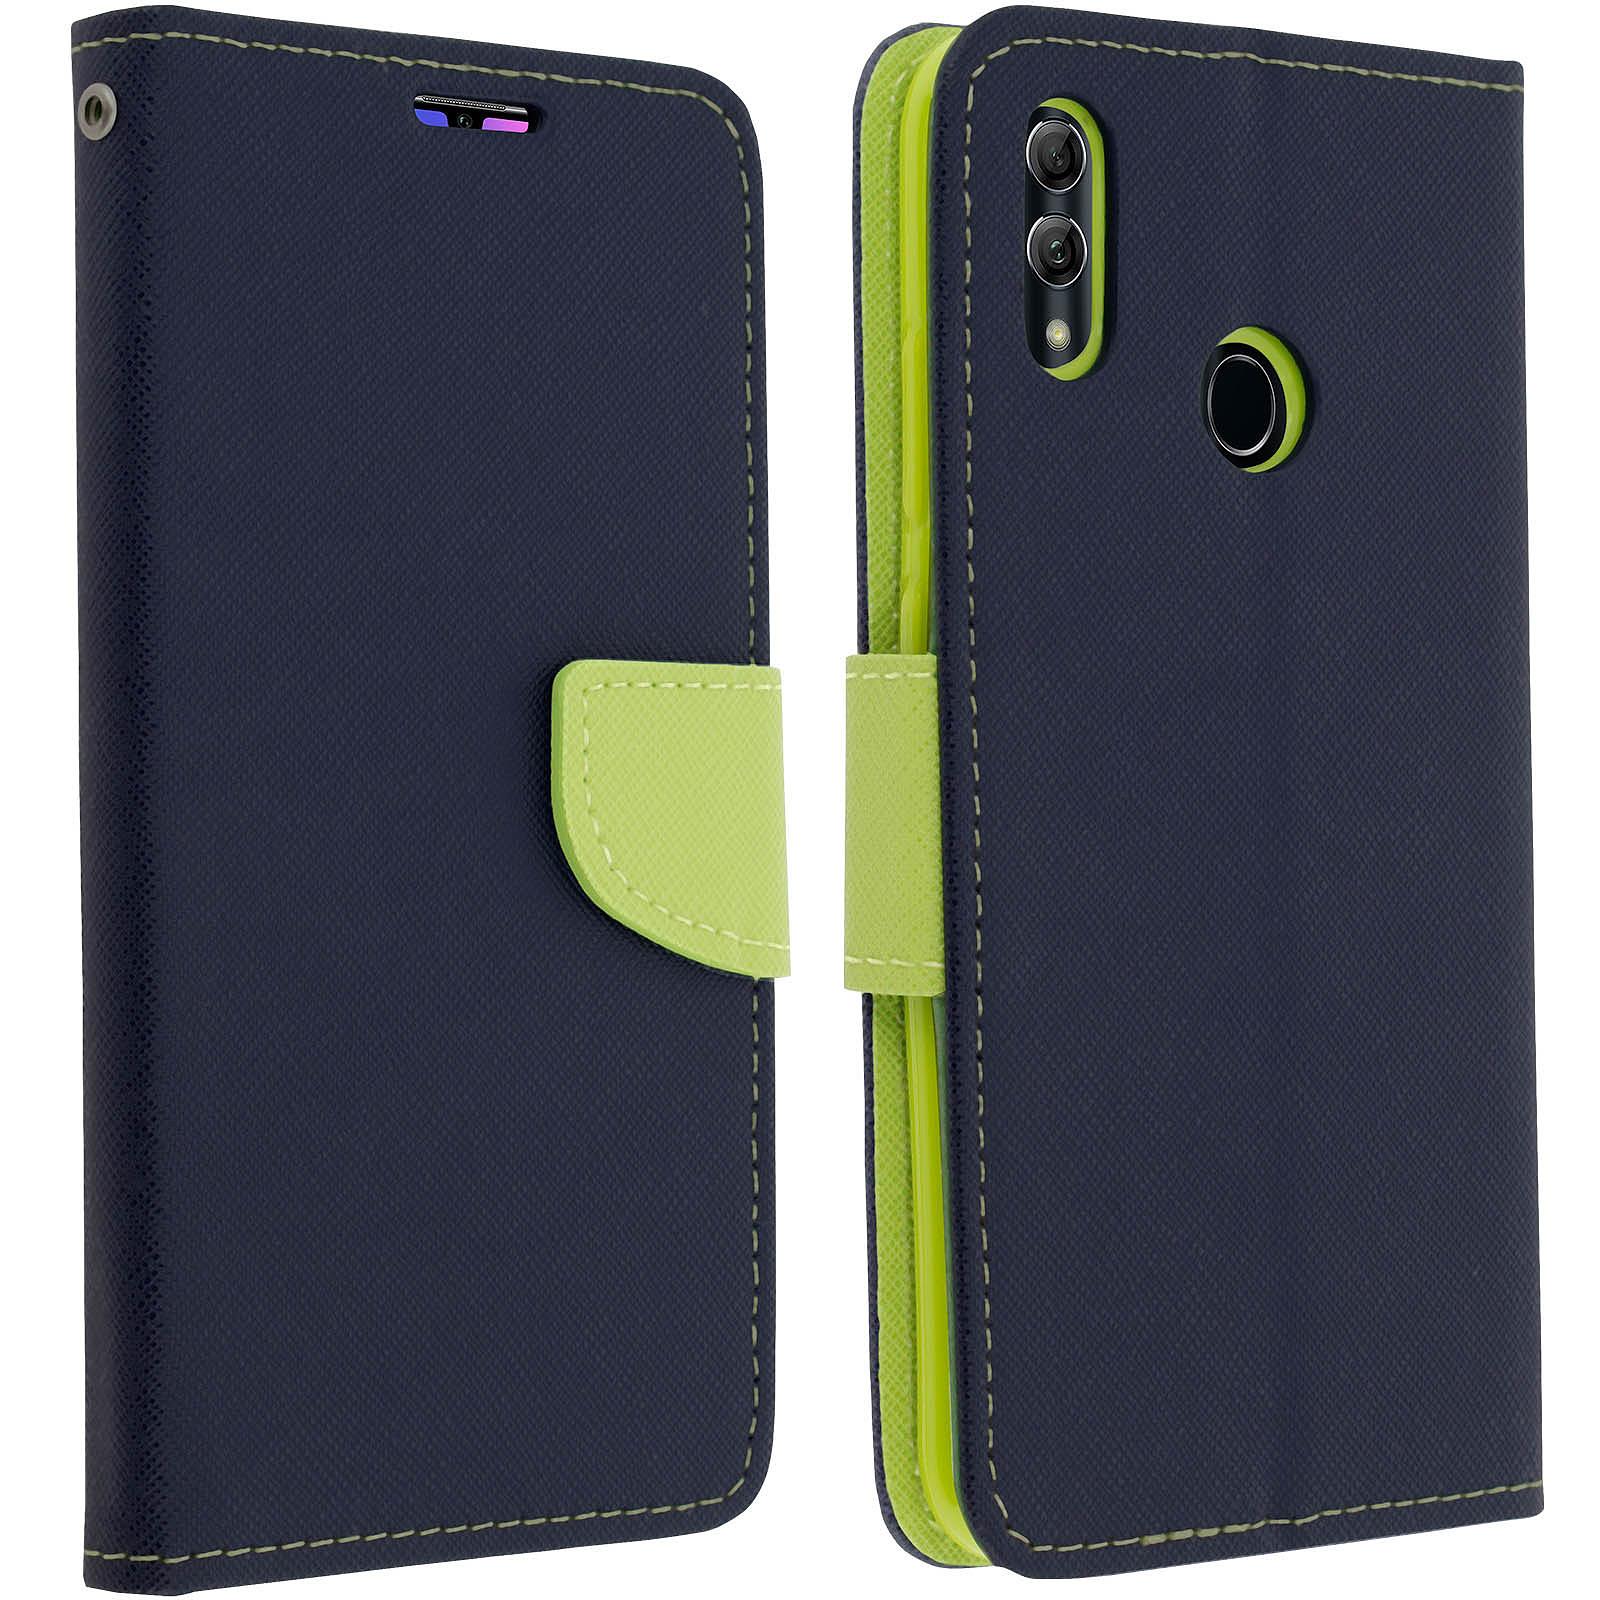 Avizar Etui folio Bleu Nuit Fancy Style pour Huawei P Smart 2019 , Honor 10 Lite